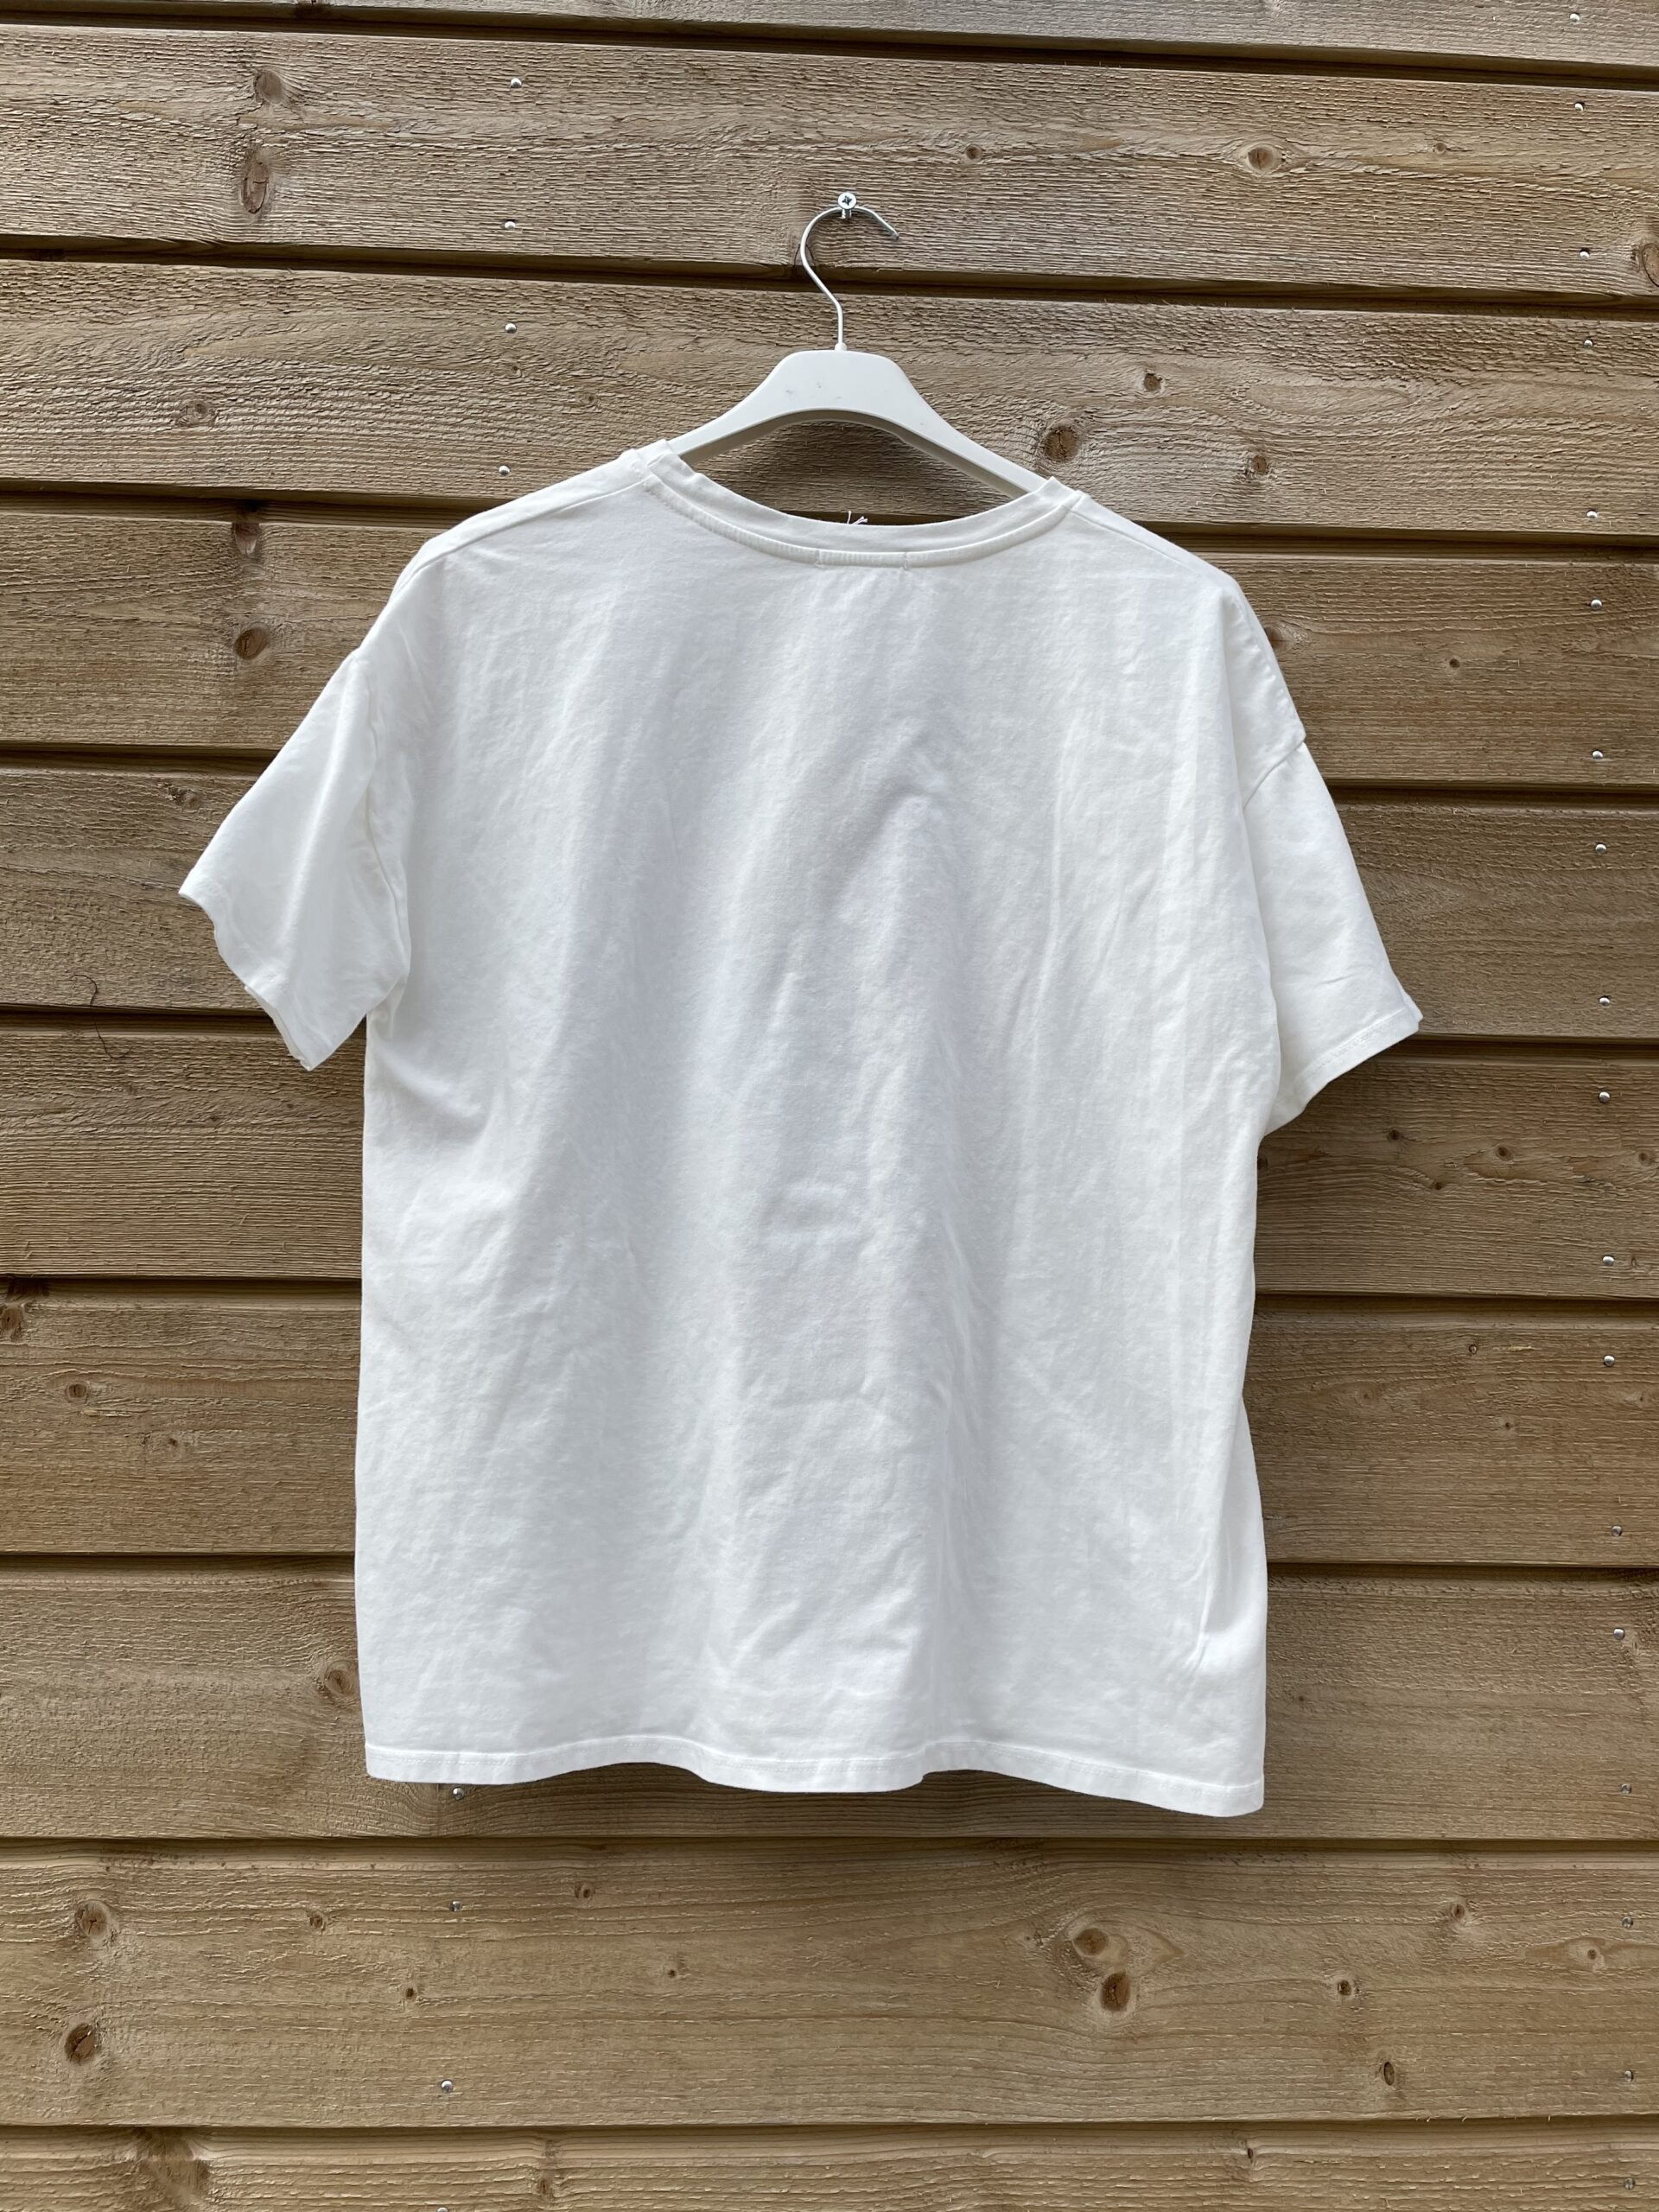 Adelaar witte shirt - one size.